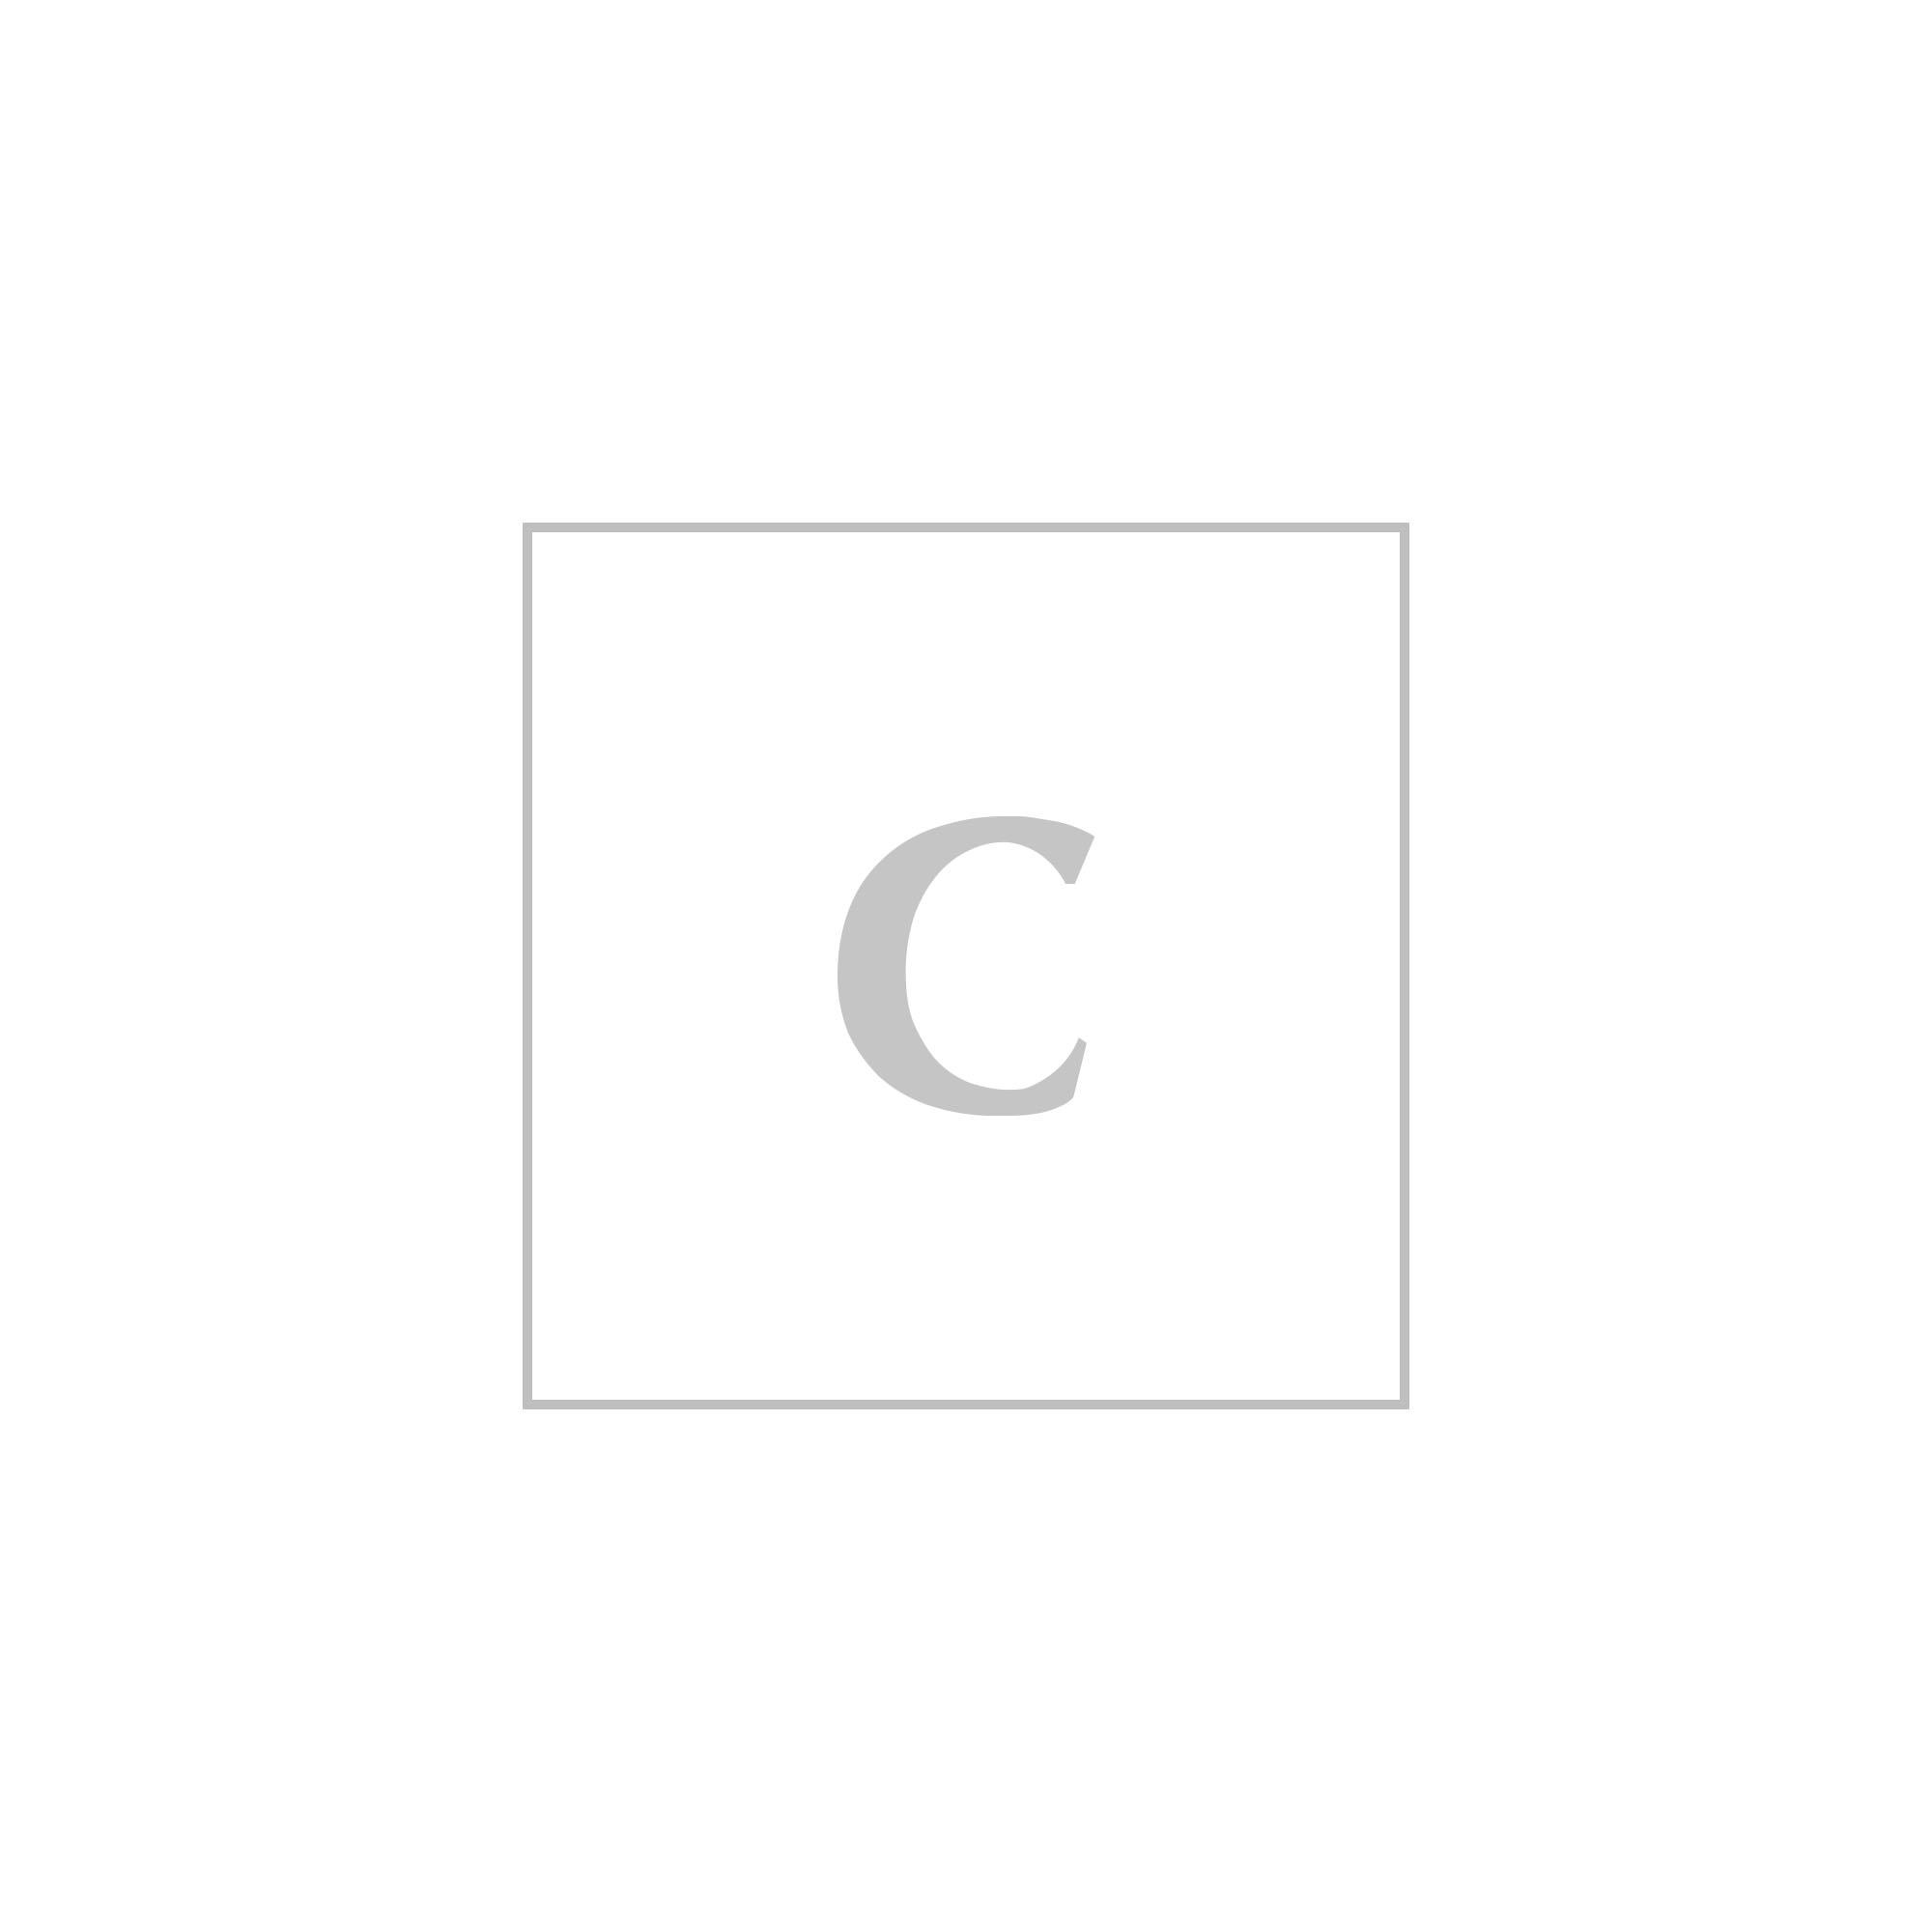 ffd8c92eaa0d25 purchase authentic prada crossbody black nylon bag 77be1 d8170; australia prada  nylon messenger bag 0f9c4 7cb5e